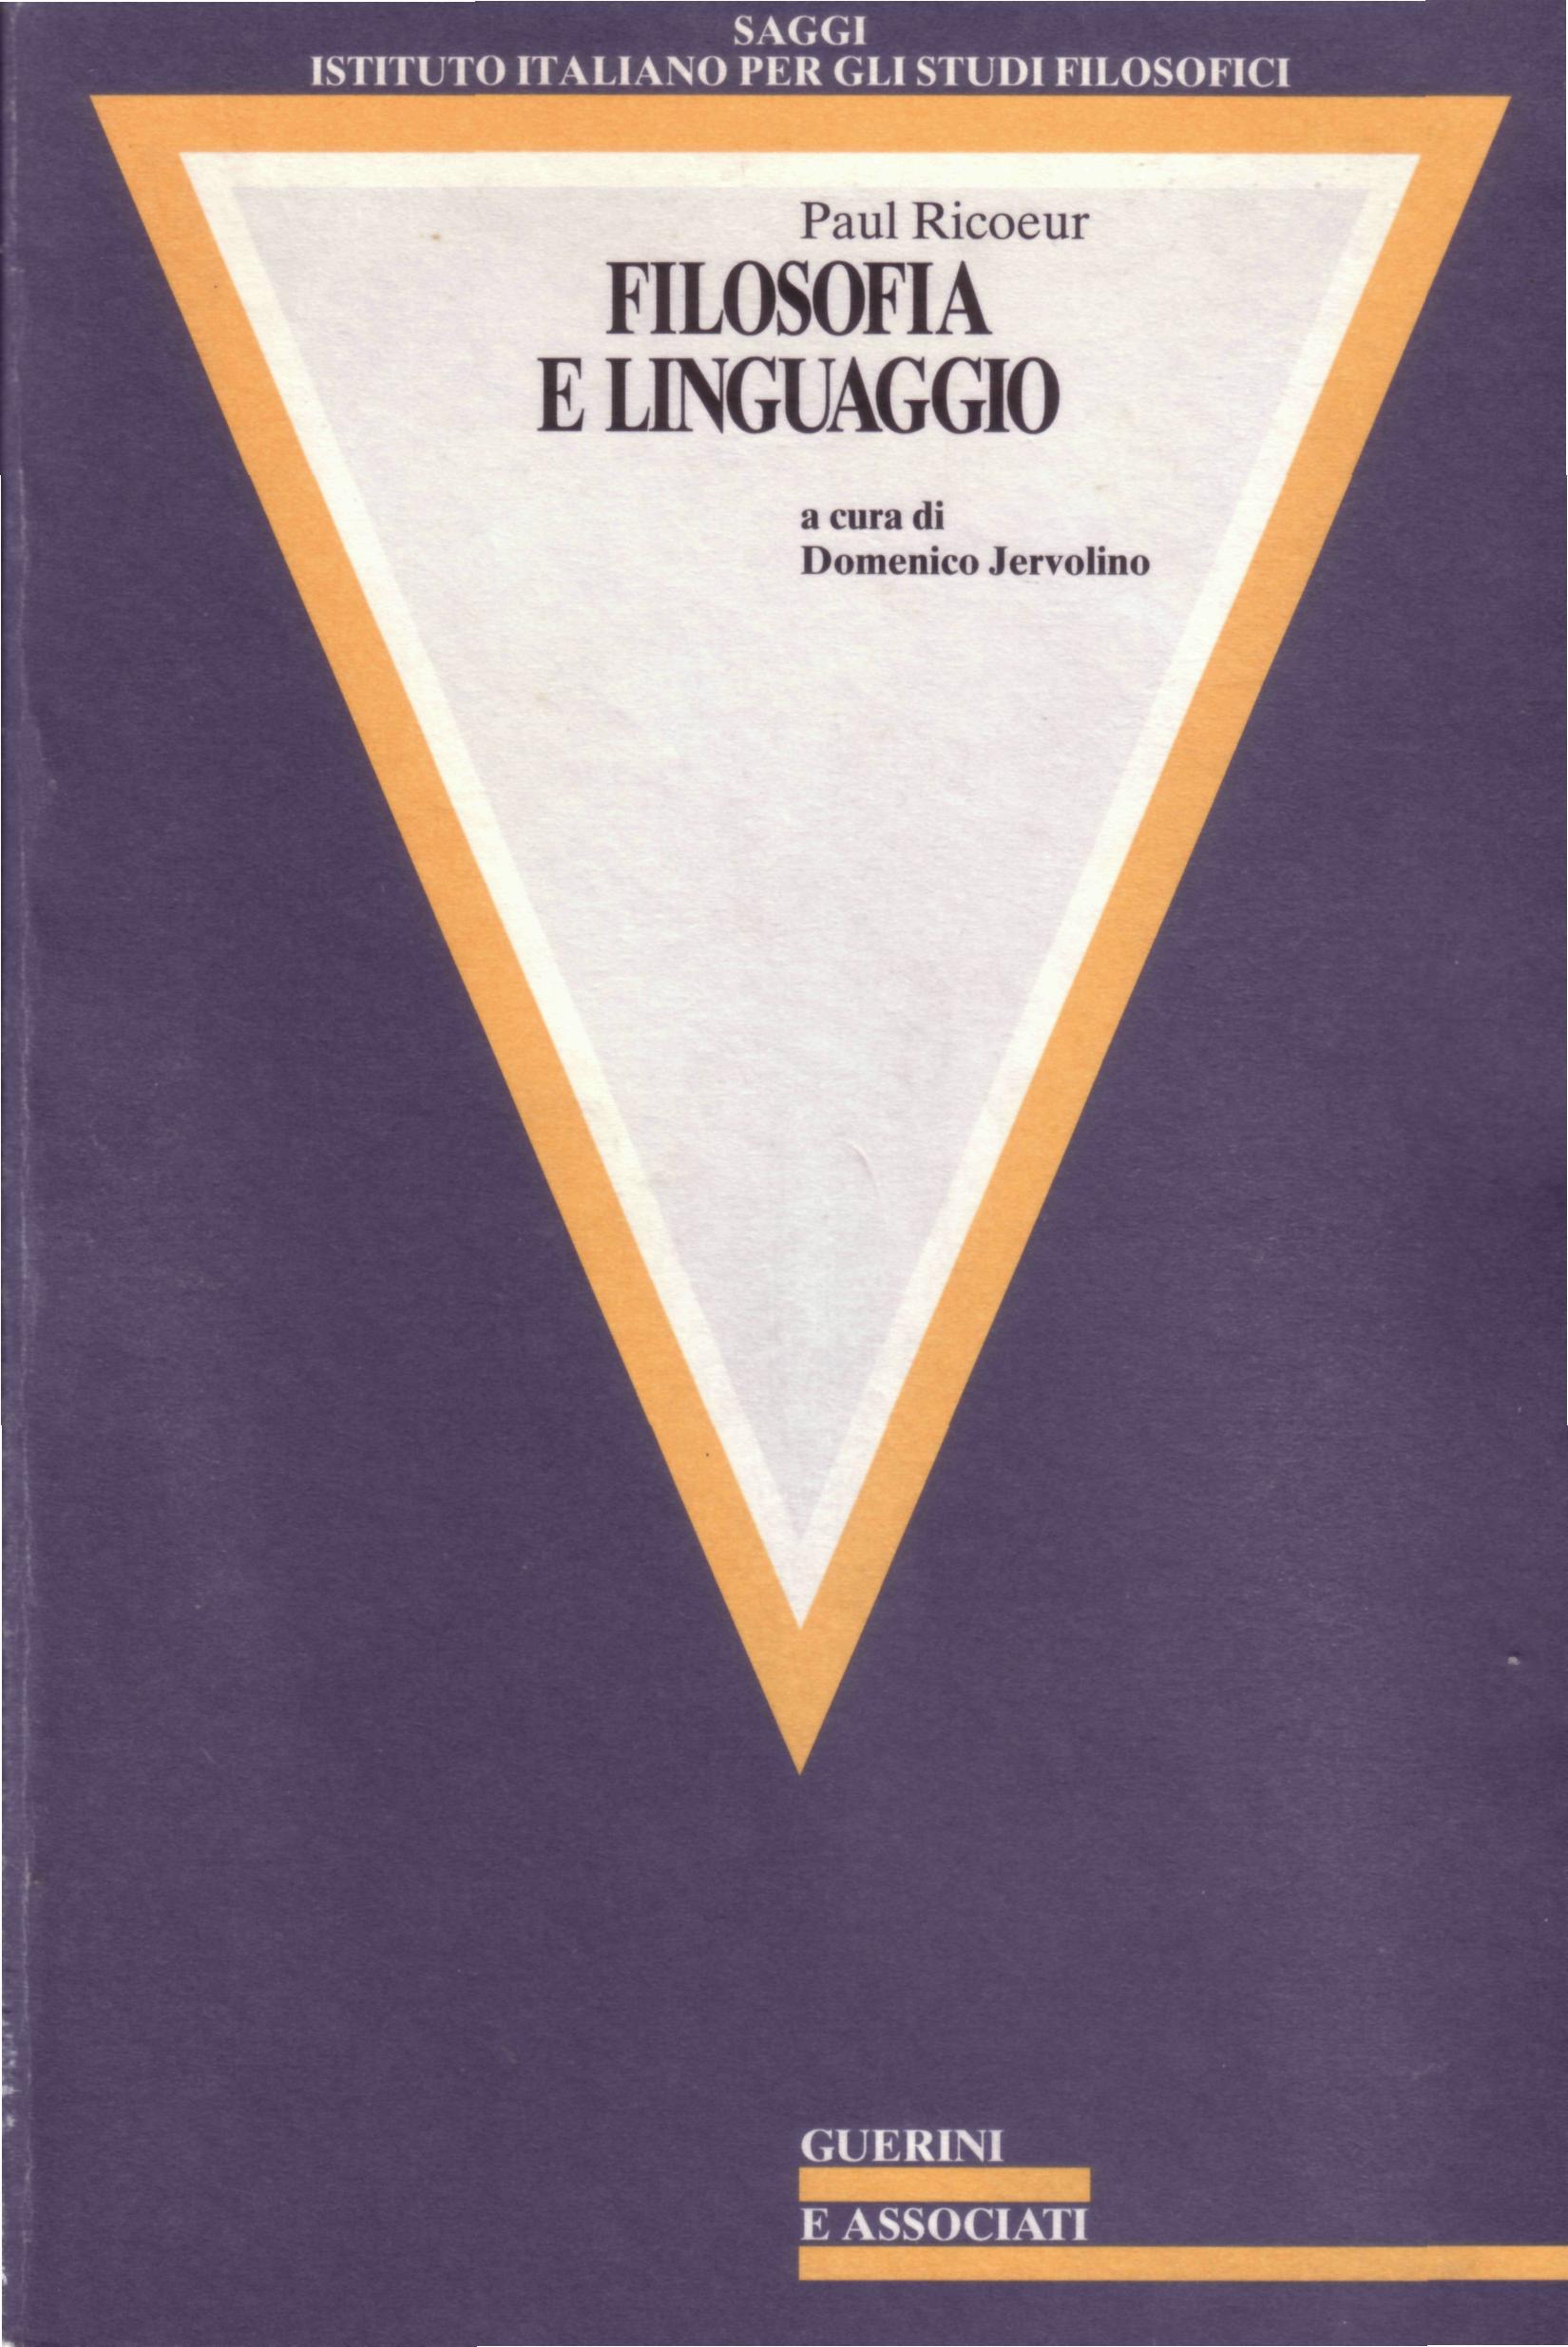 Filosofia e linguaggio